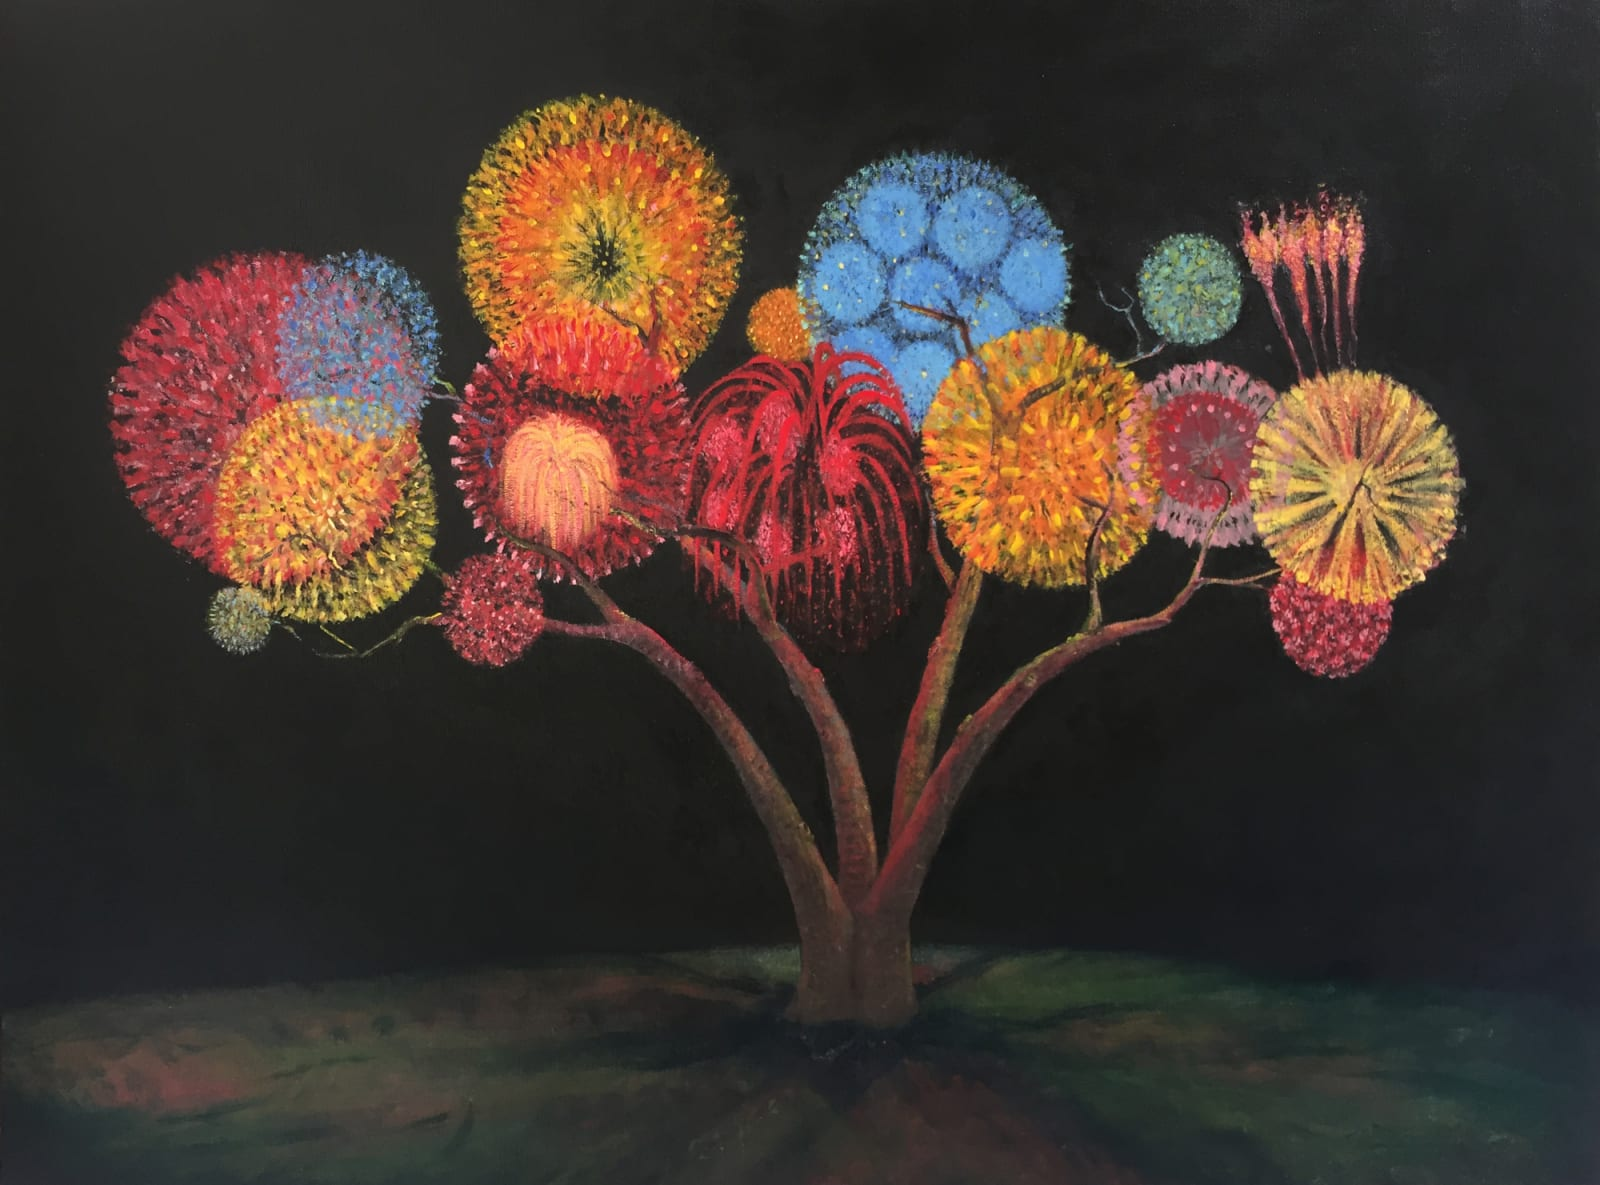 Ari Lankin, Tree IV, 2019